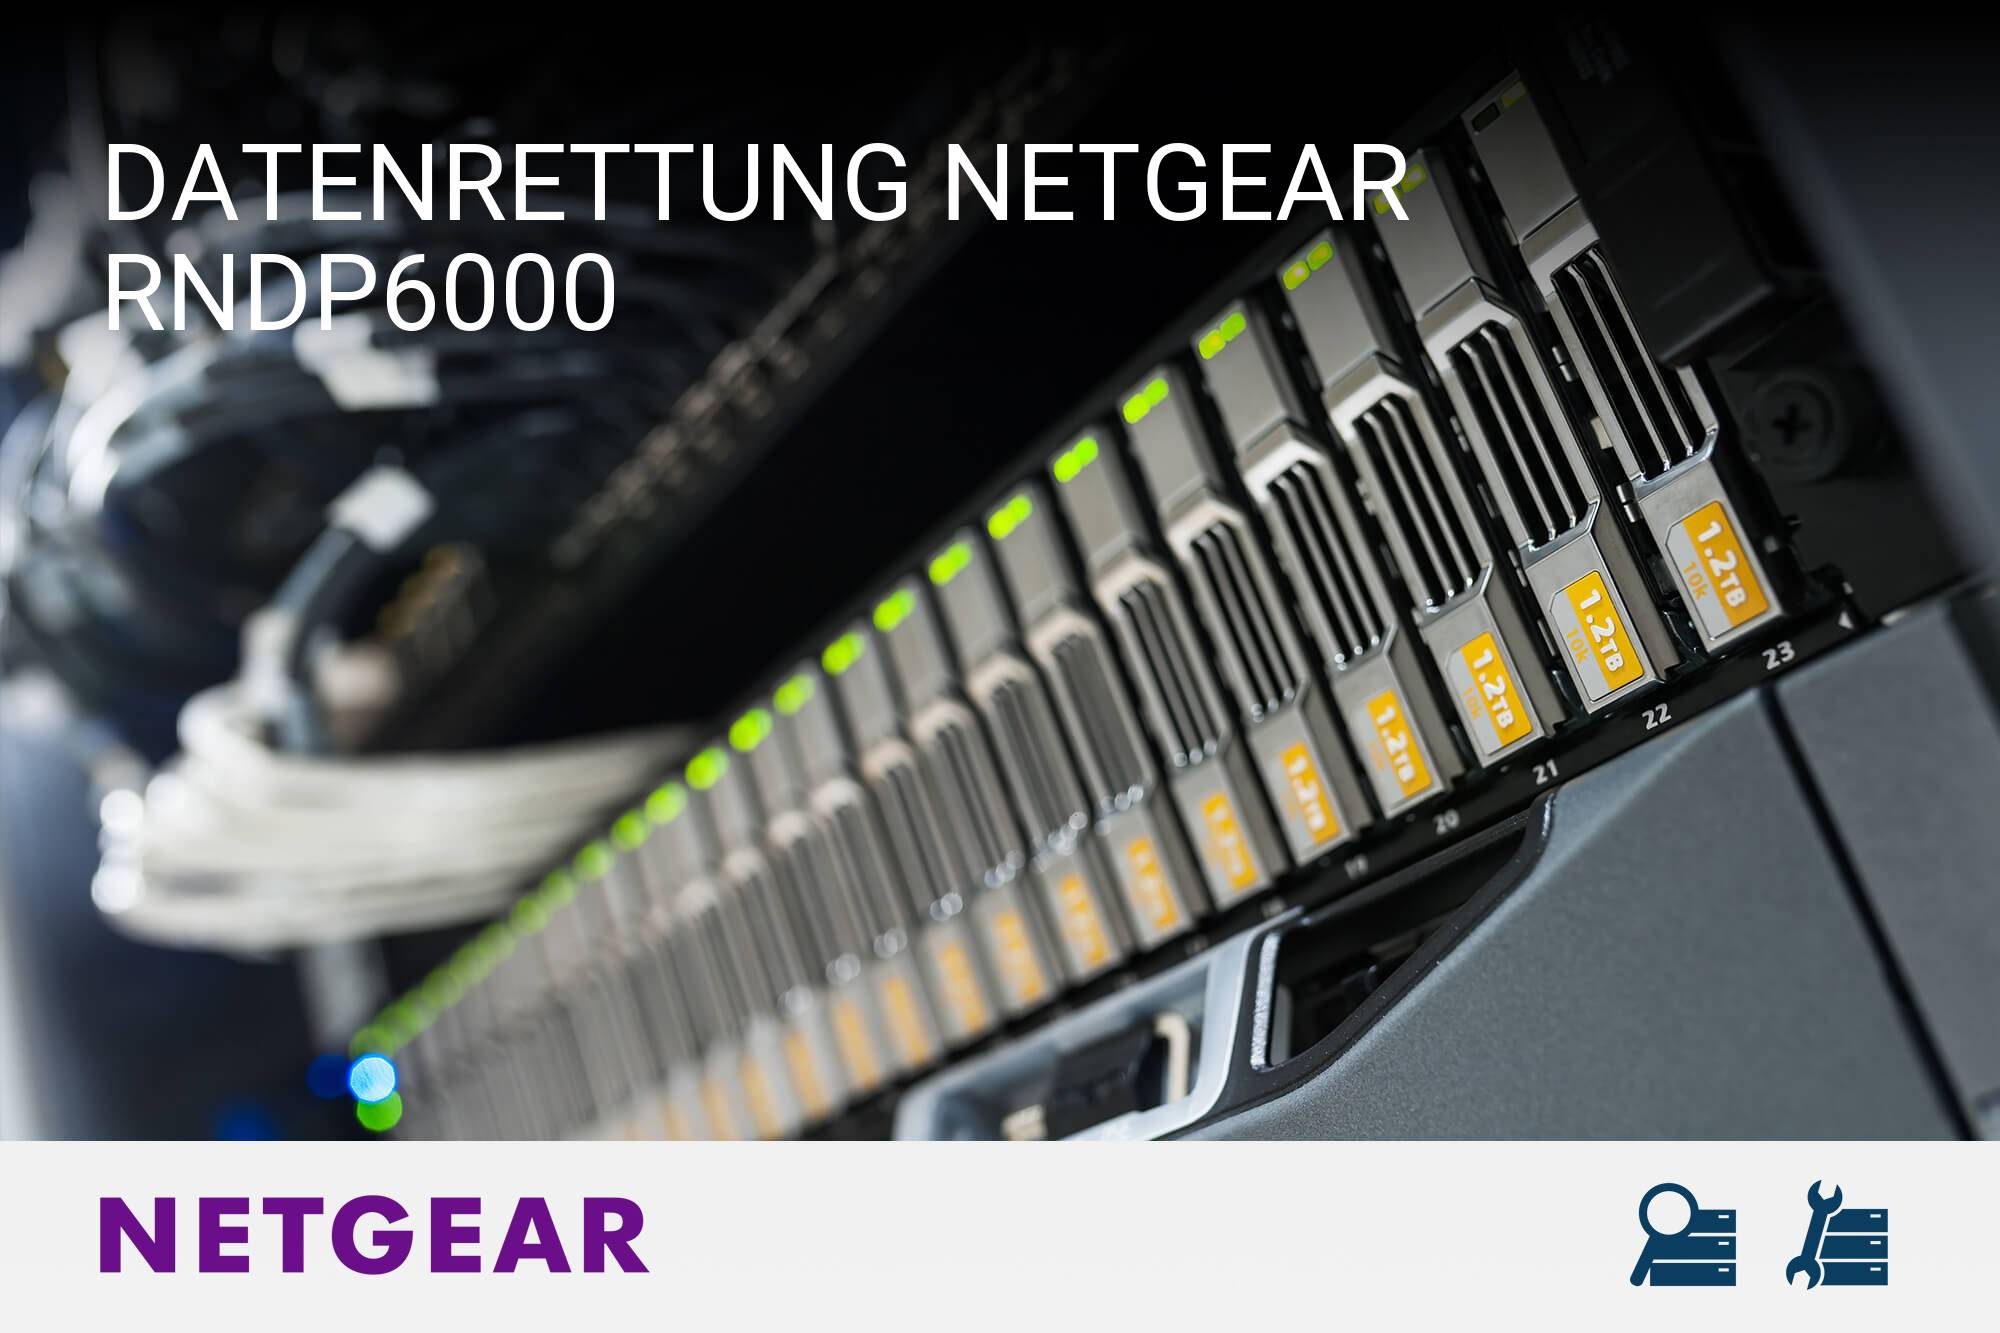 Netgear RNDP6000